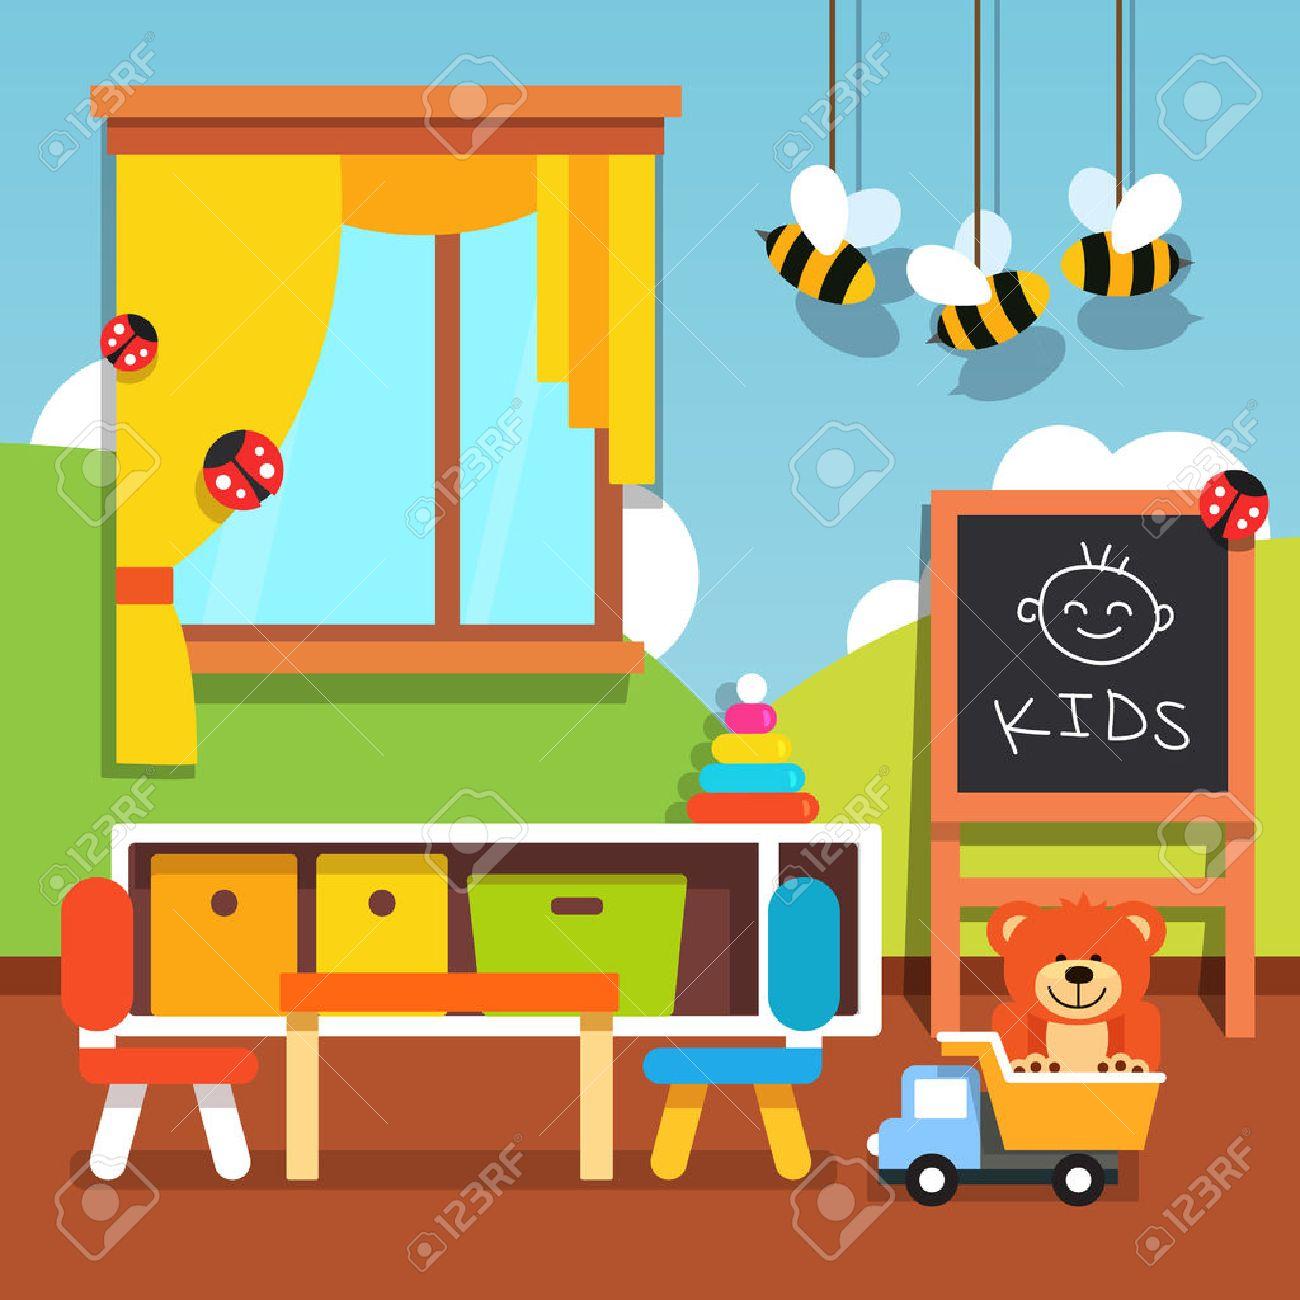 Preschool kindergarten classroom with desk, chairs, chalkboard...